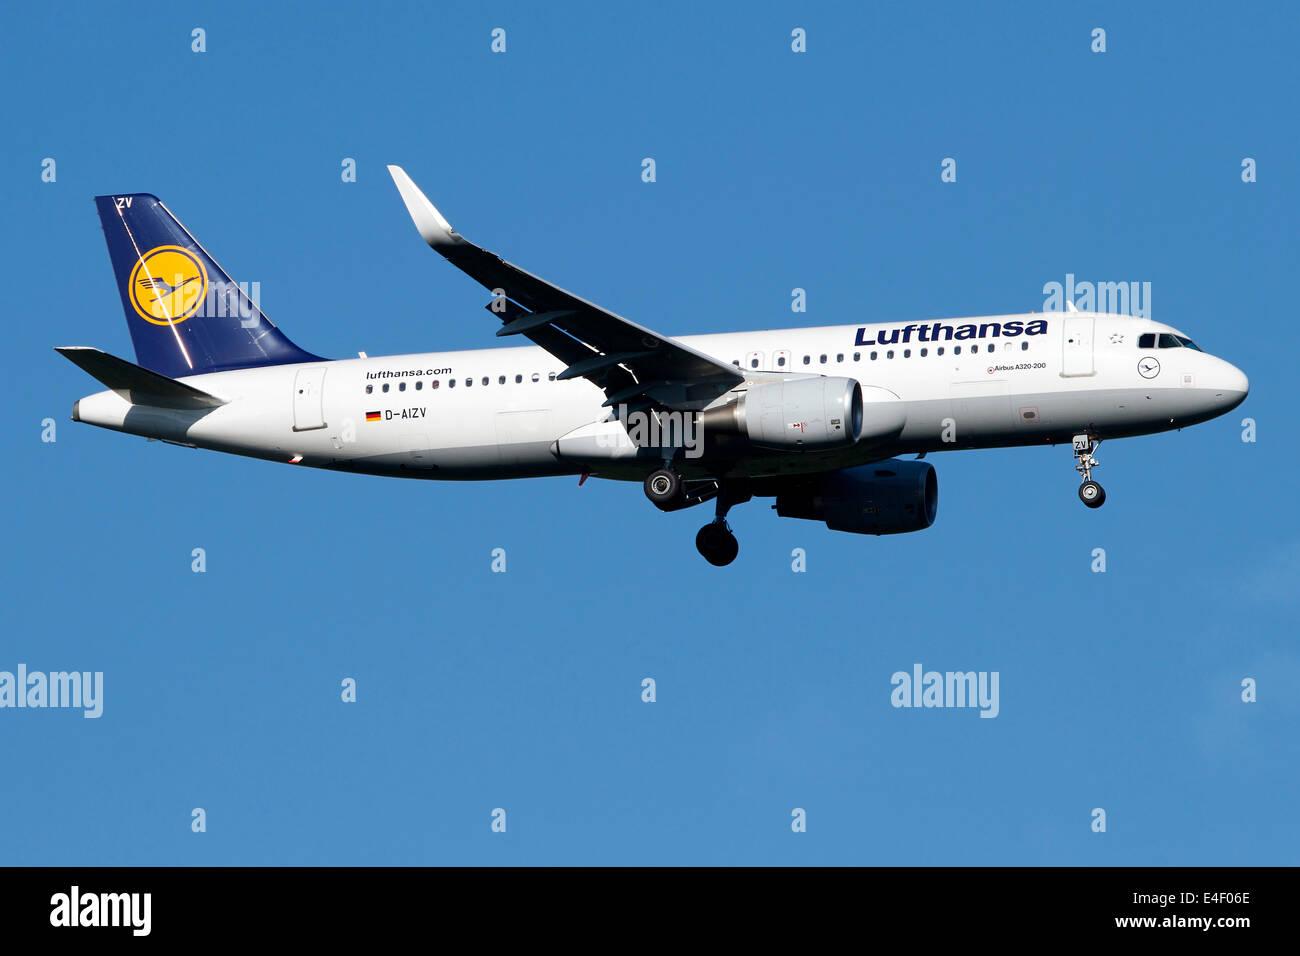 A Lufthansa Airbus A320-200 sharklet. - Stock Image